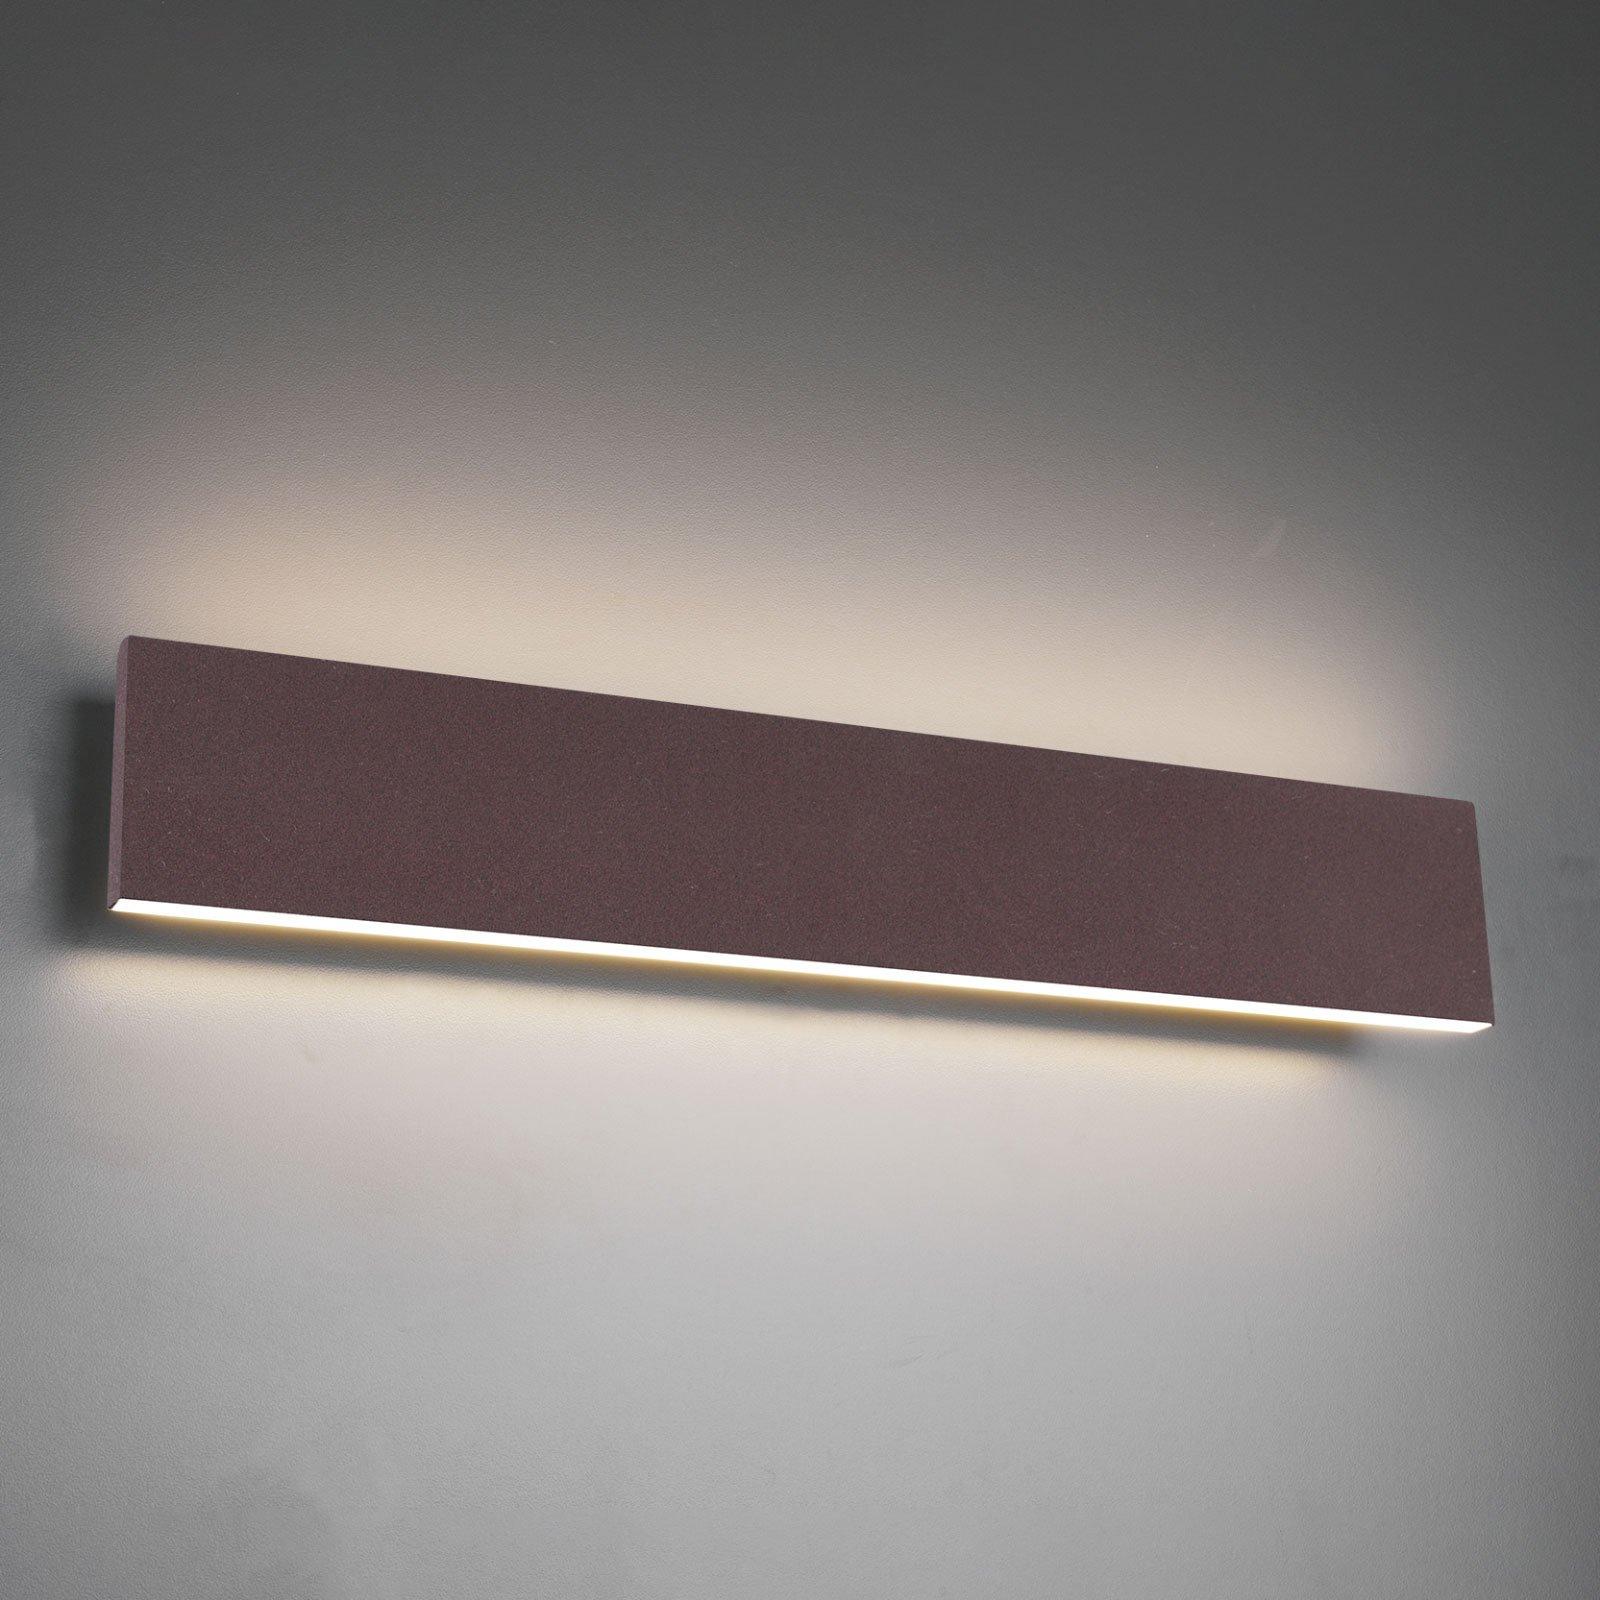 LED-vegglampe Concha 47 cm, rust